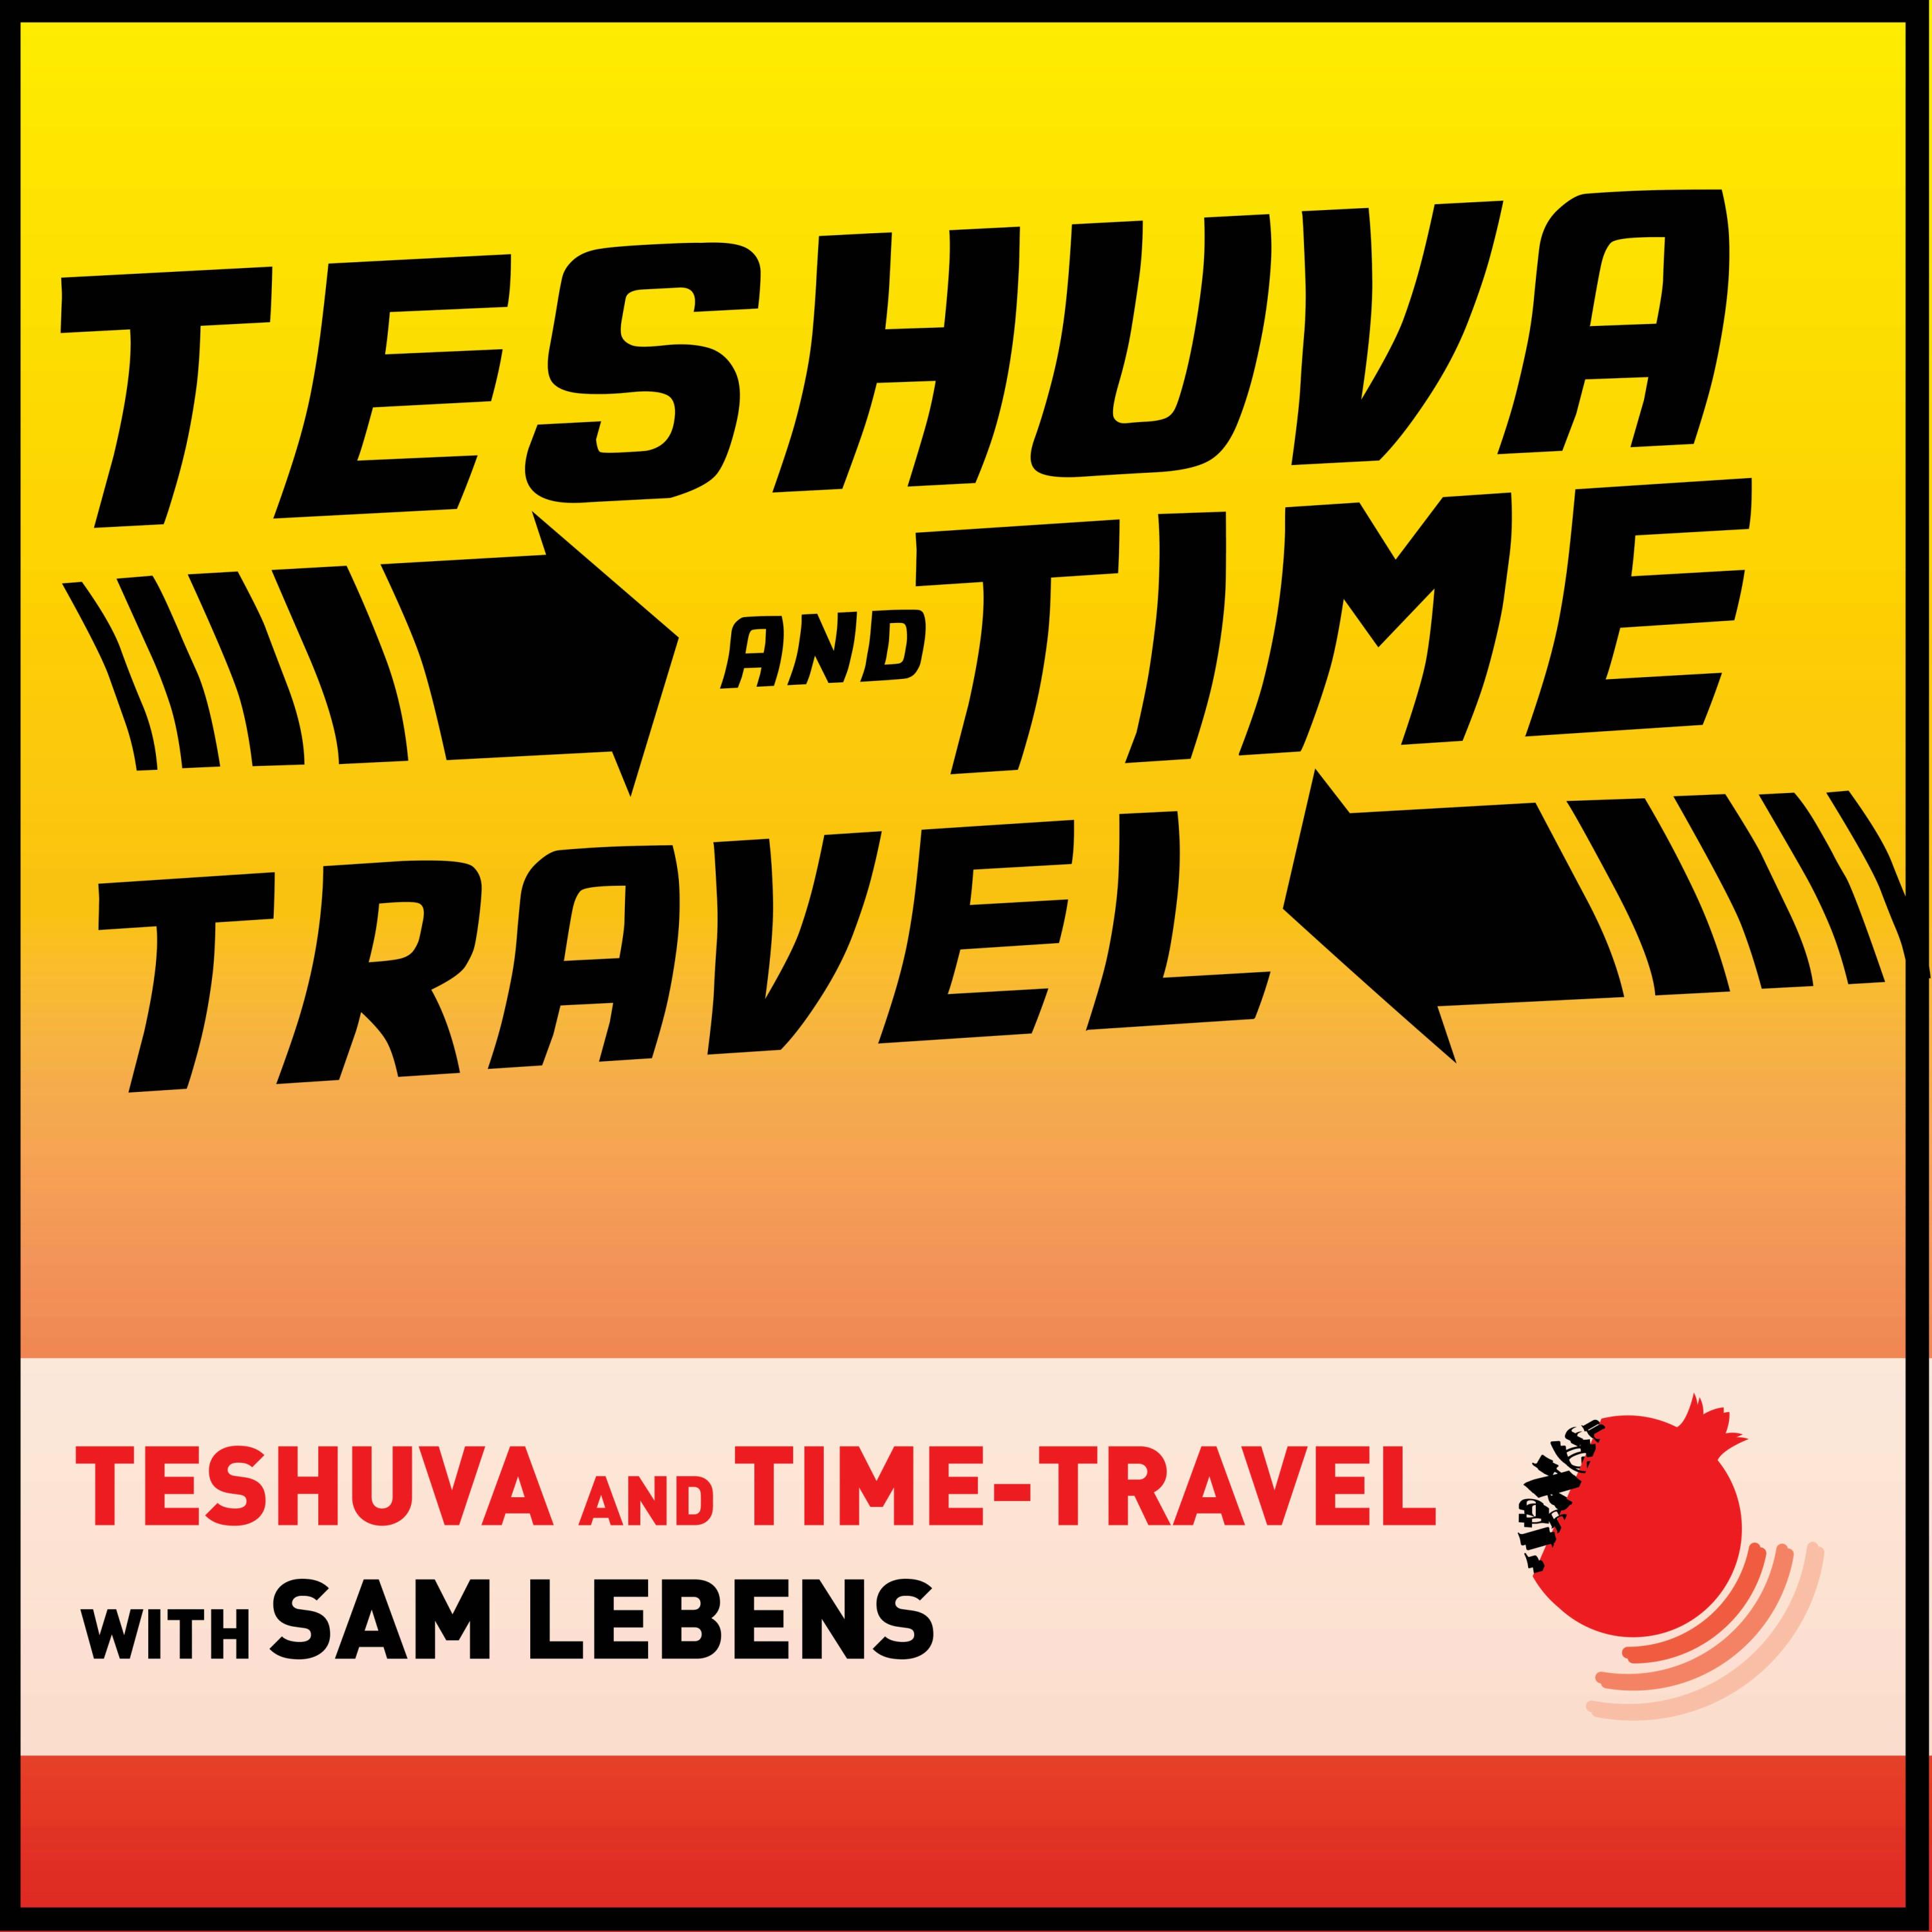 Teshuva and Time Travel